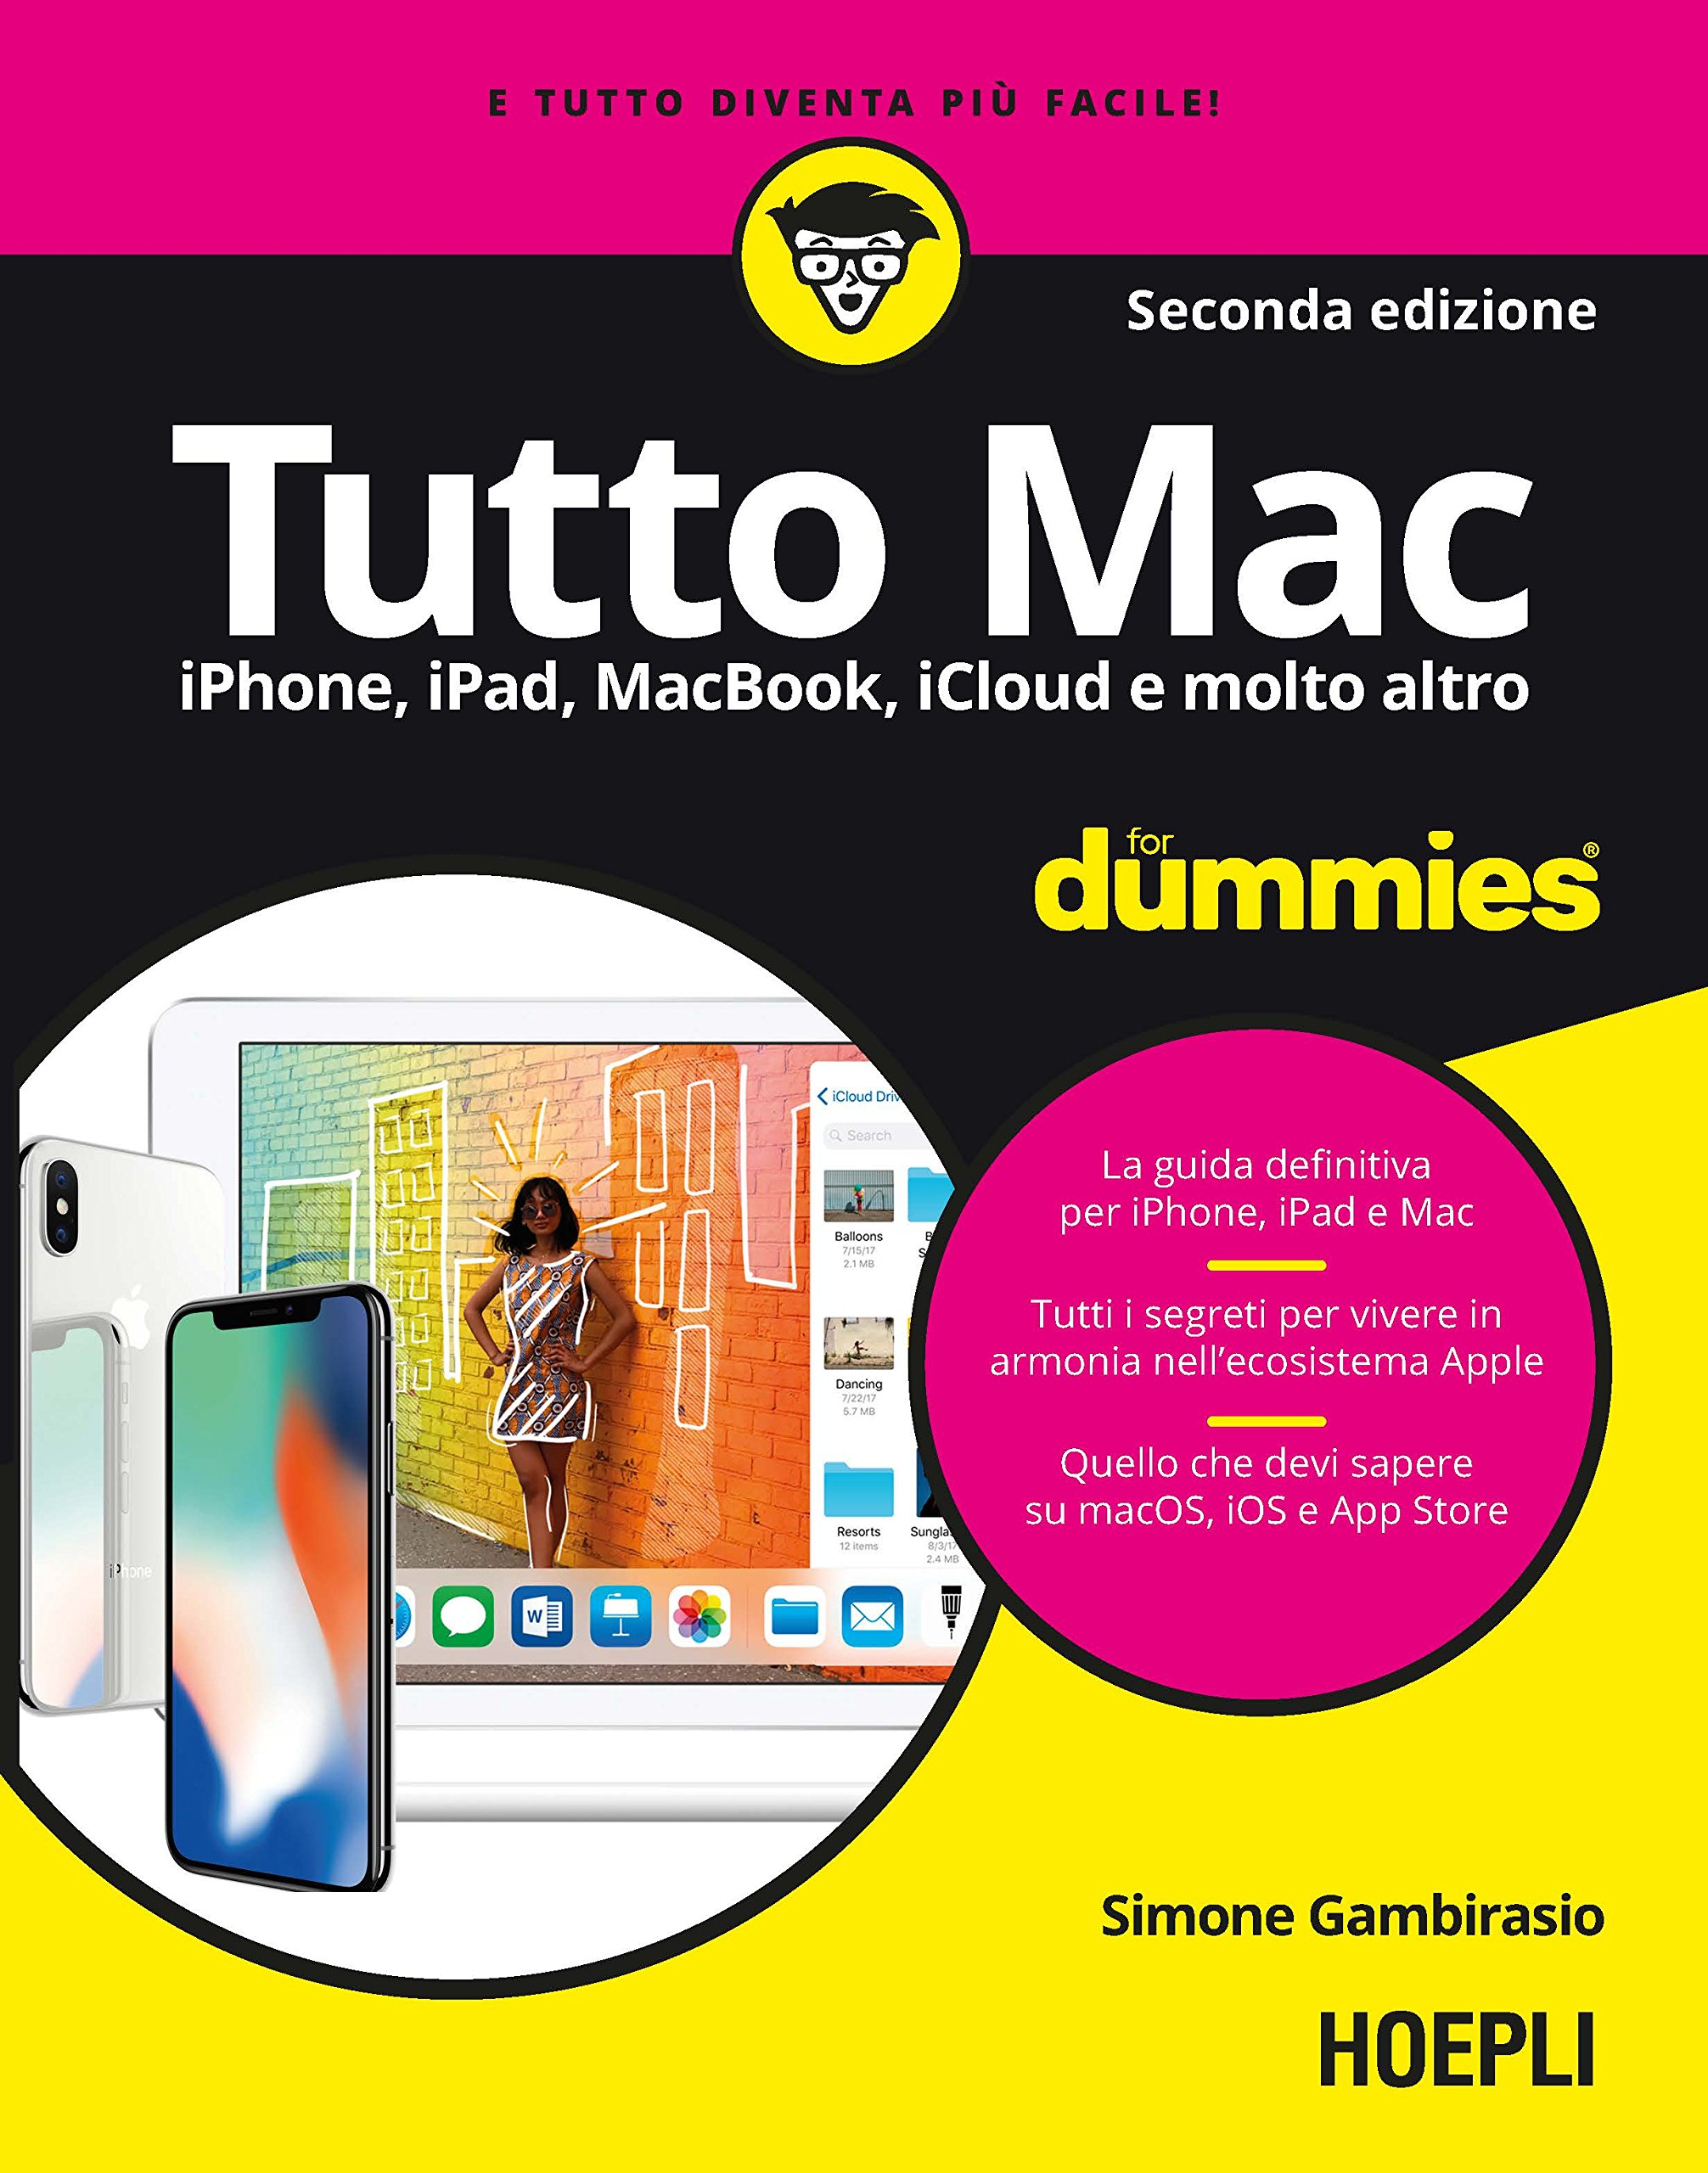 Amazon it: Tutto Mac for dummies  IPhone, iPad, iMac